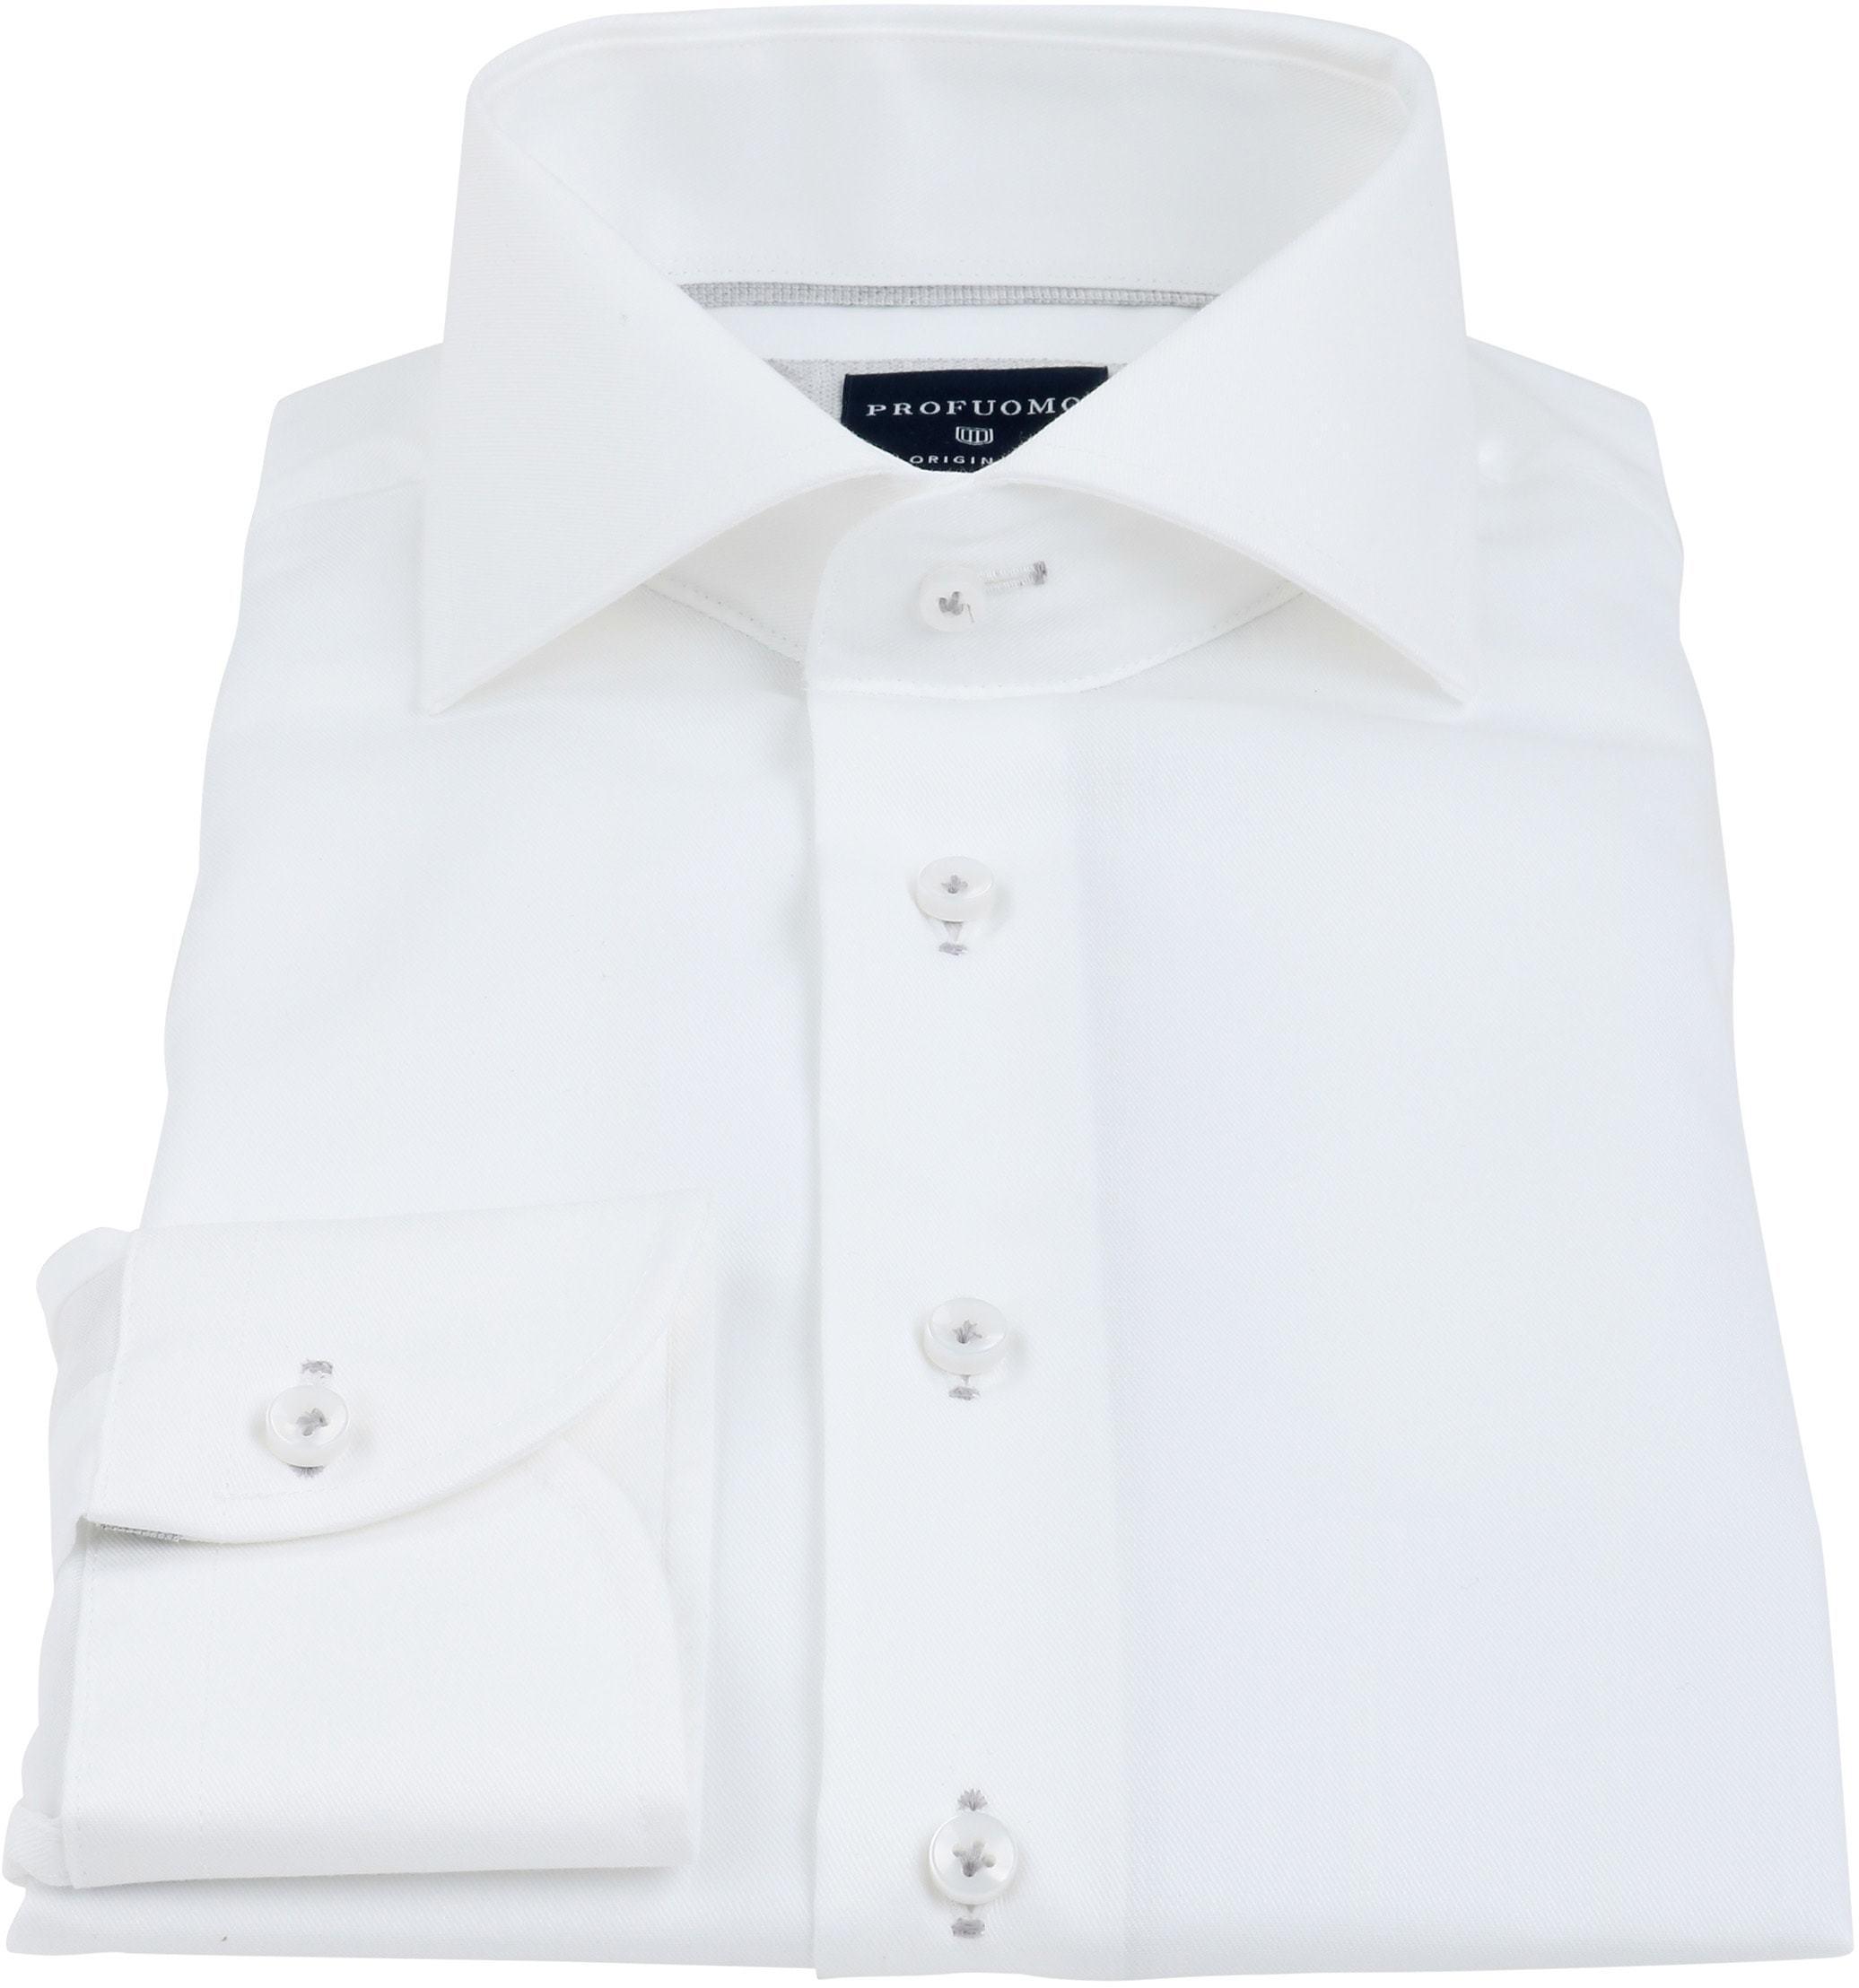 Profuomo Overhemd Strijkvrij Wit Grijs foto 2